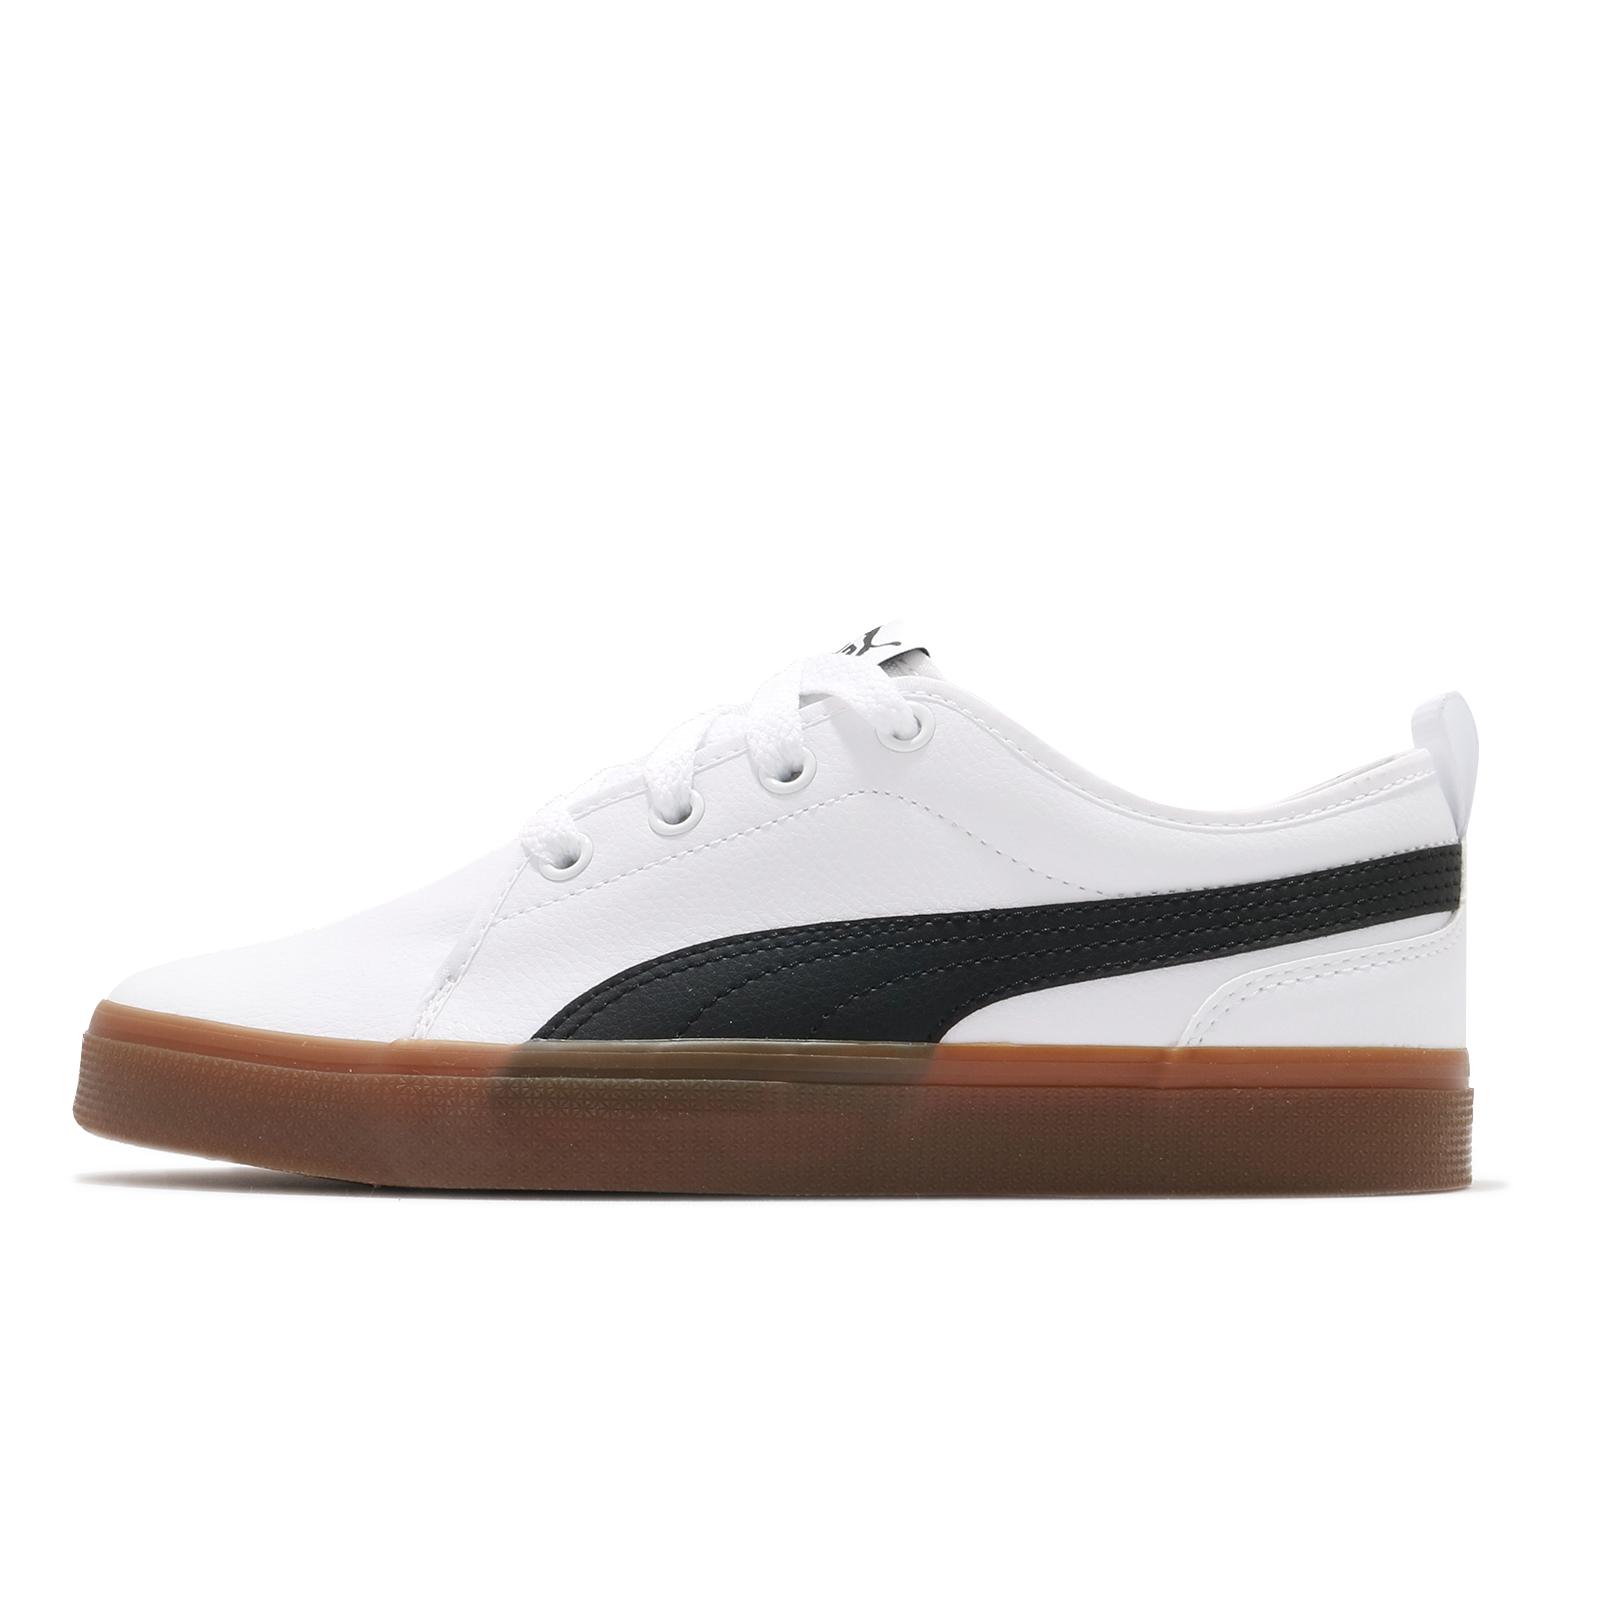 Puma 休閒鞋 S Street Vulc NC GC 白 黑 皮革 男女鞋 膠底設計 【ACS】 36792801